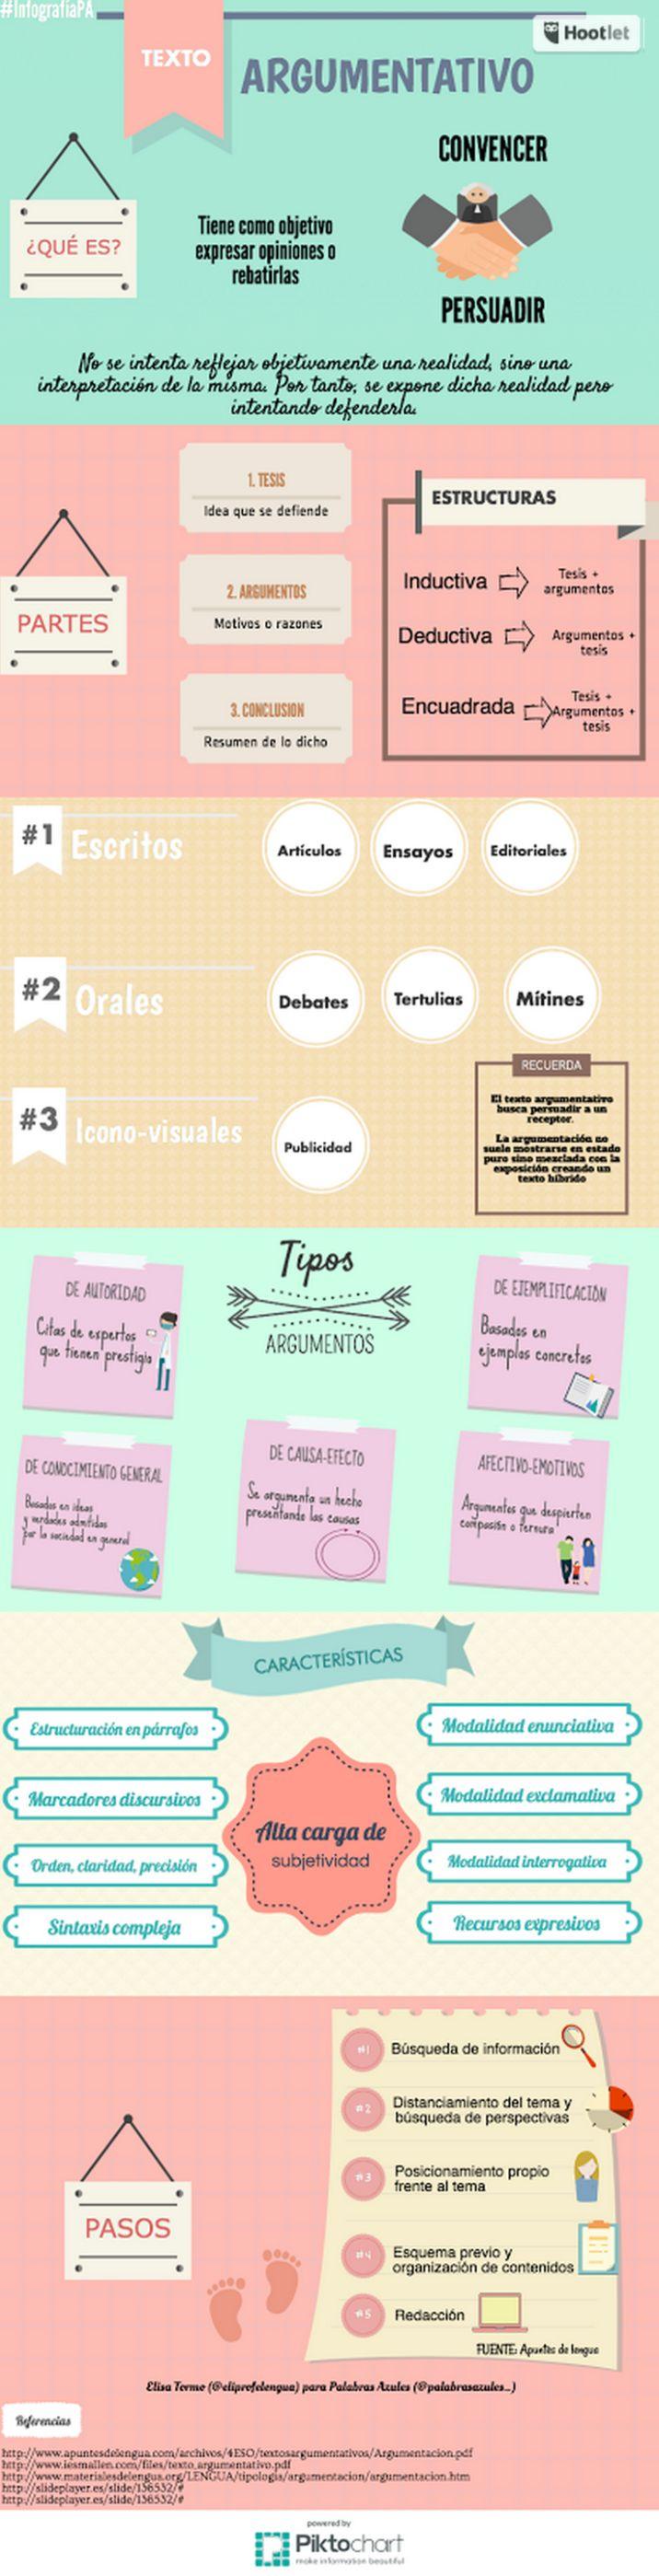 "Recursos didácticos para imprimir, ver, leer: ""Texto argumentativo"" (Infografía de alfredovela.files.wordpress.com)"